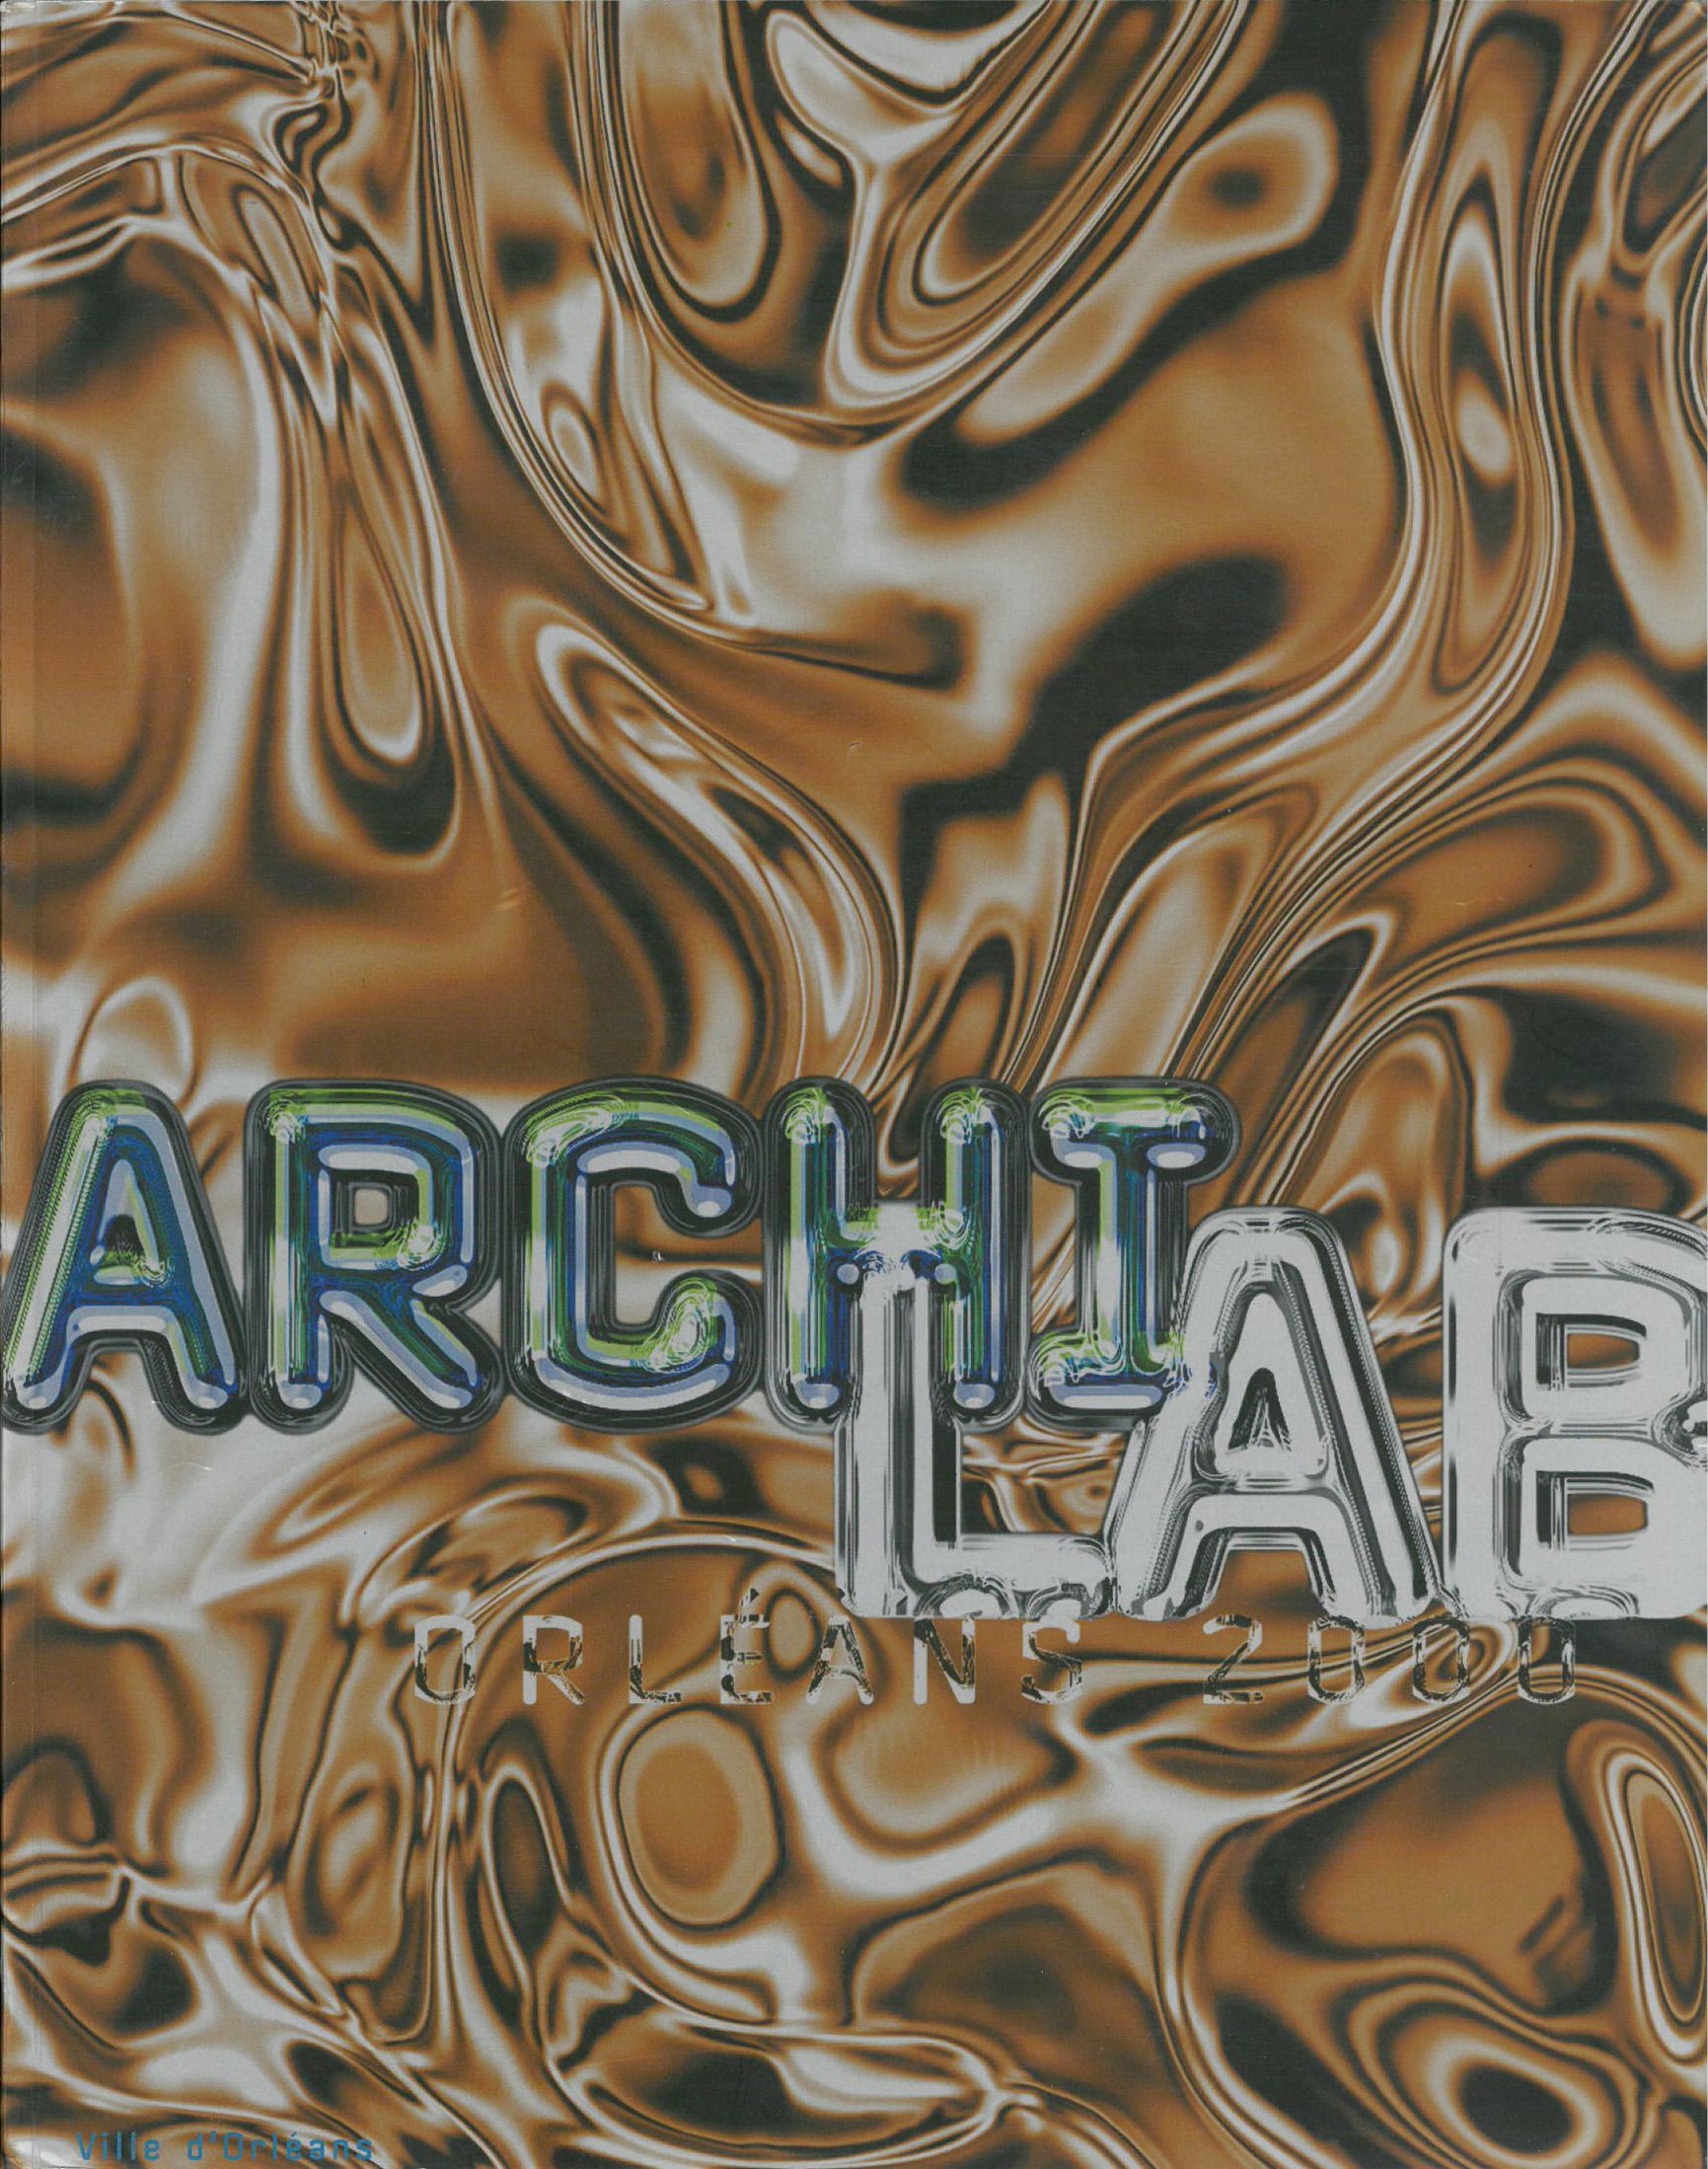 Archilab 2001